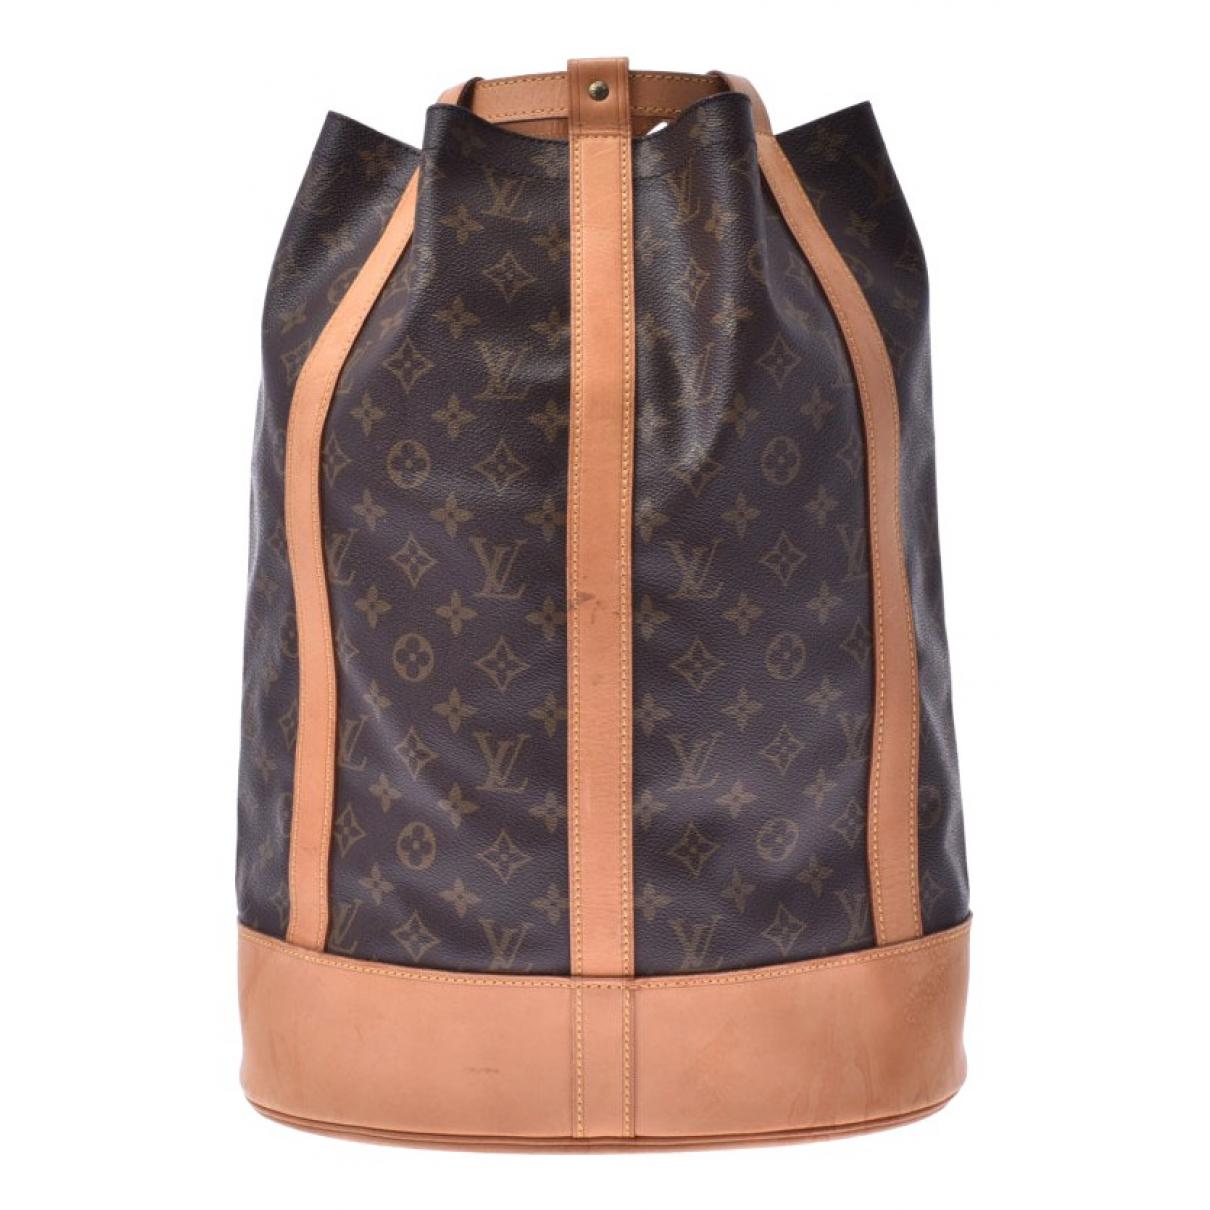 Mochila Randonnee de Lona Louis Vuitton